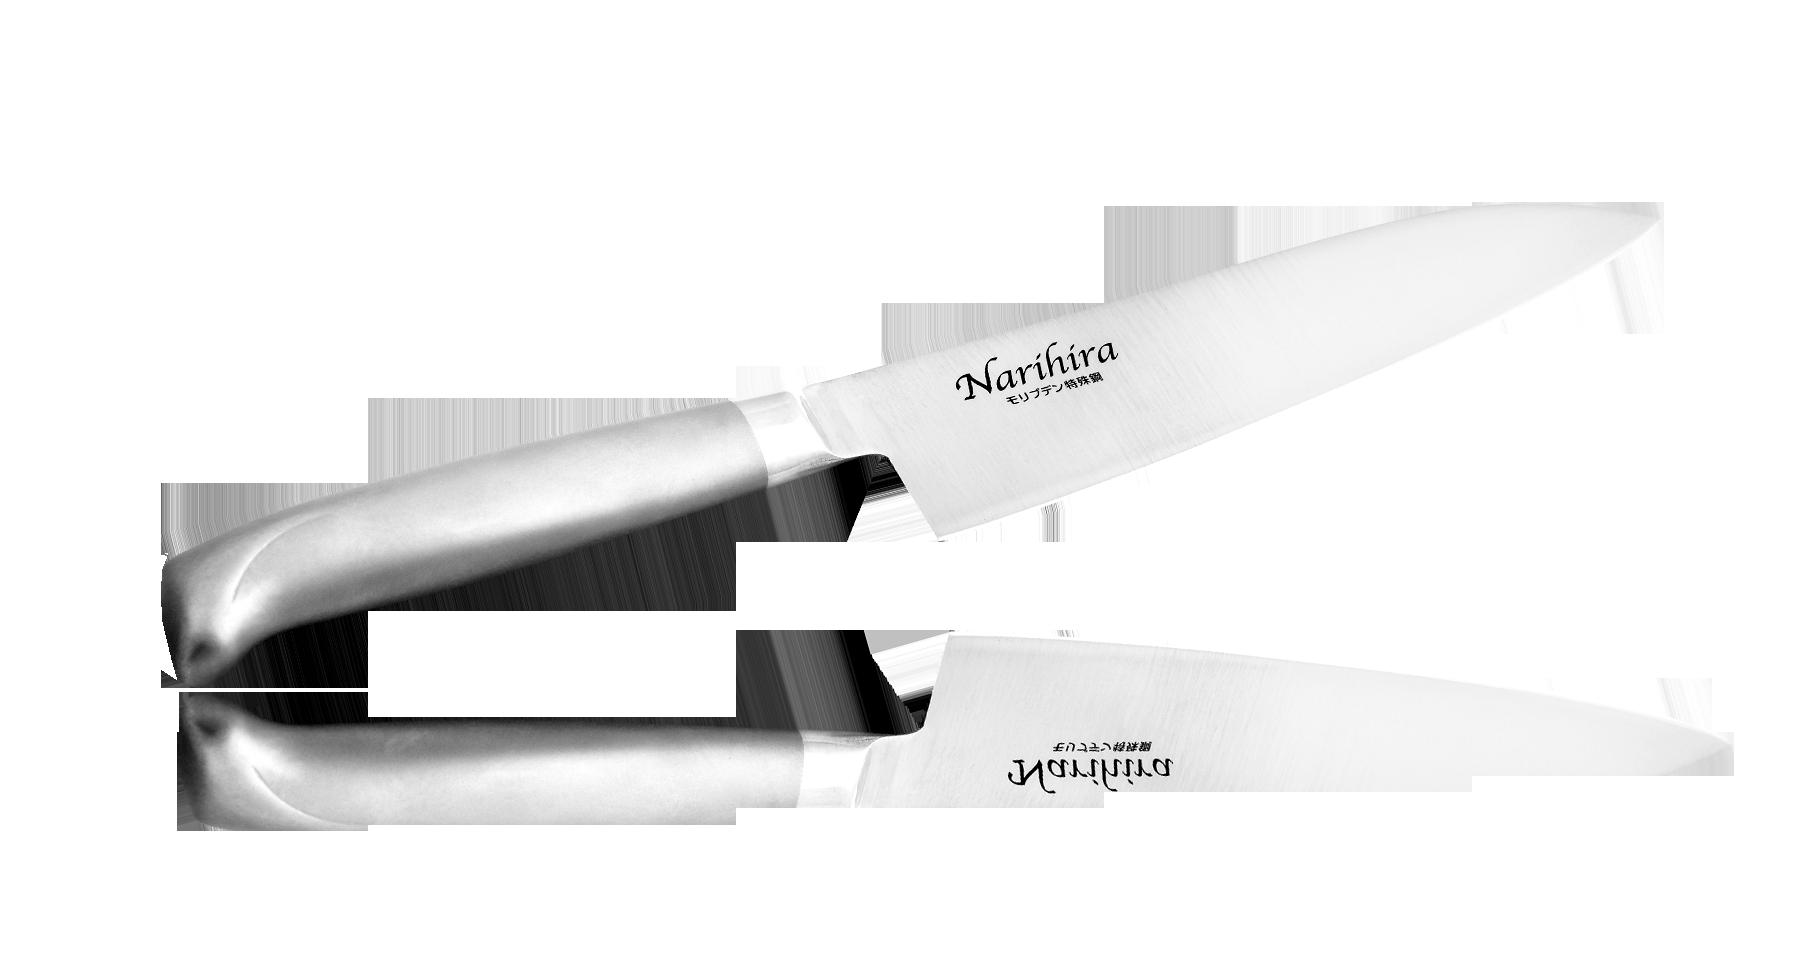 Нож Сантоку Narihira Fuji Cutlery, FC-62, сталь Mo-V, серый